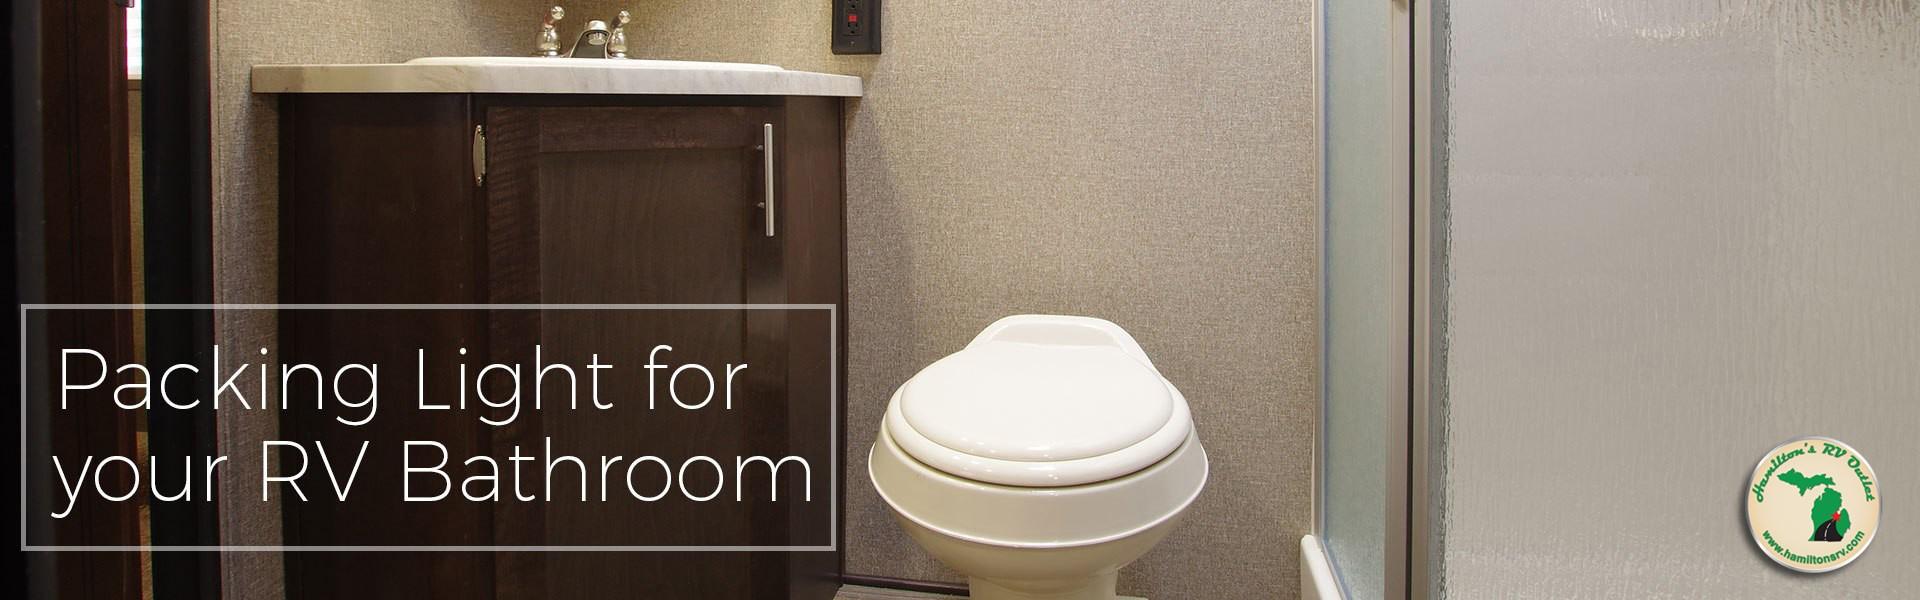 Packing Light for Your RV Bathroom  Hamiltons RV Blog